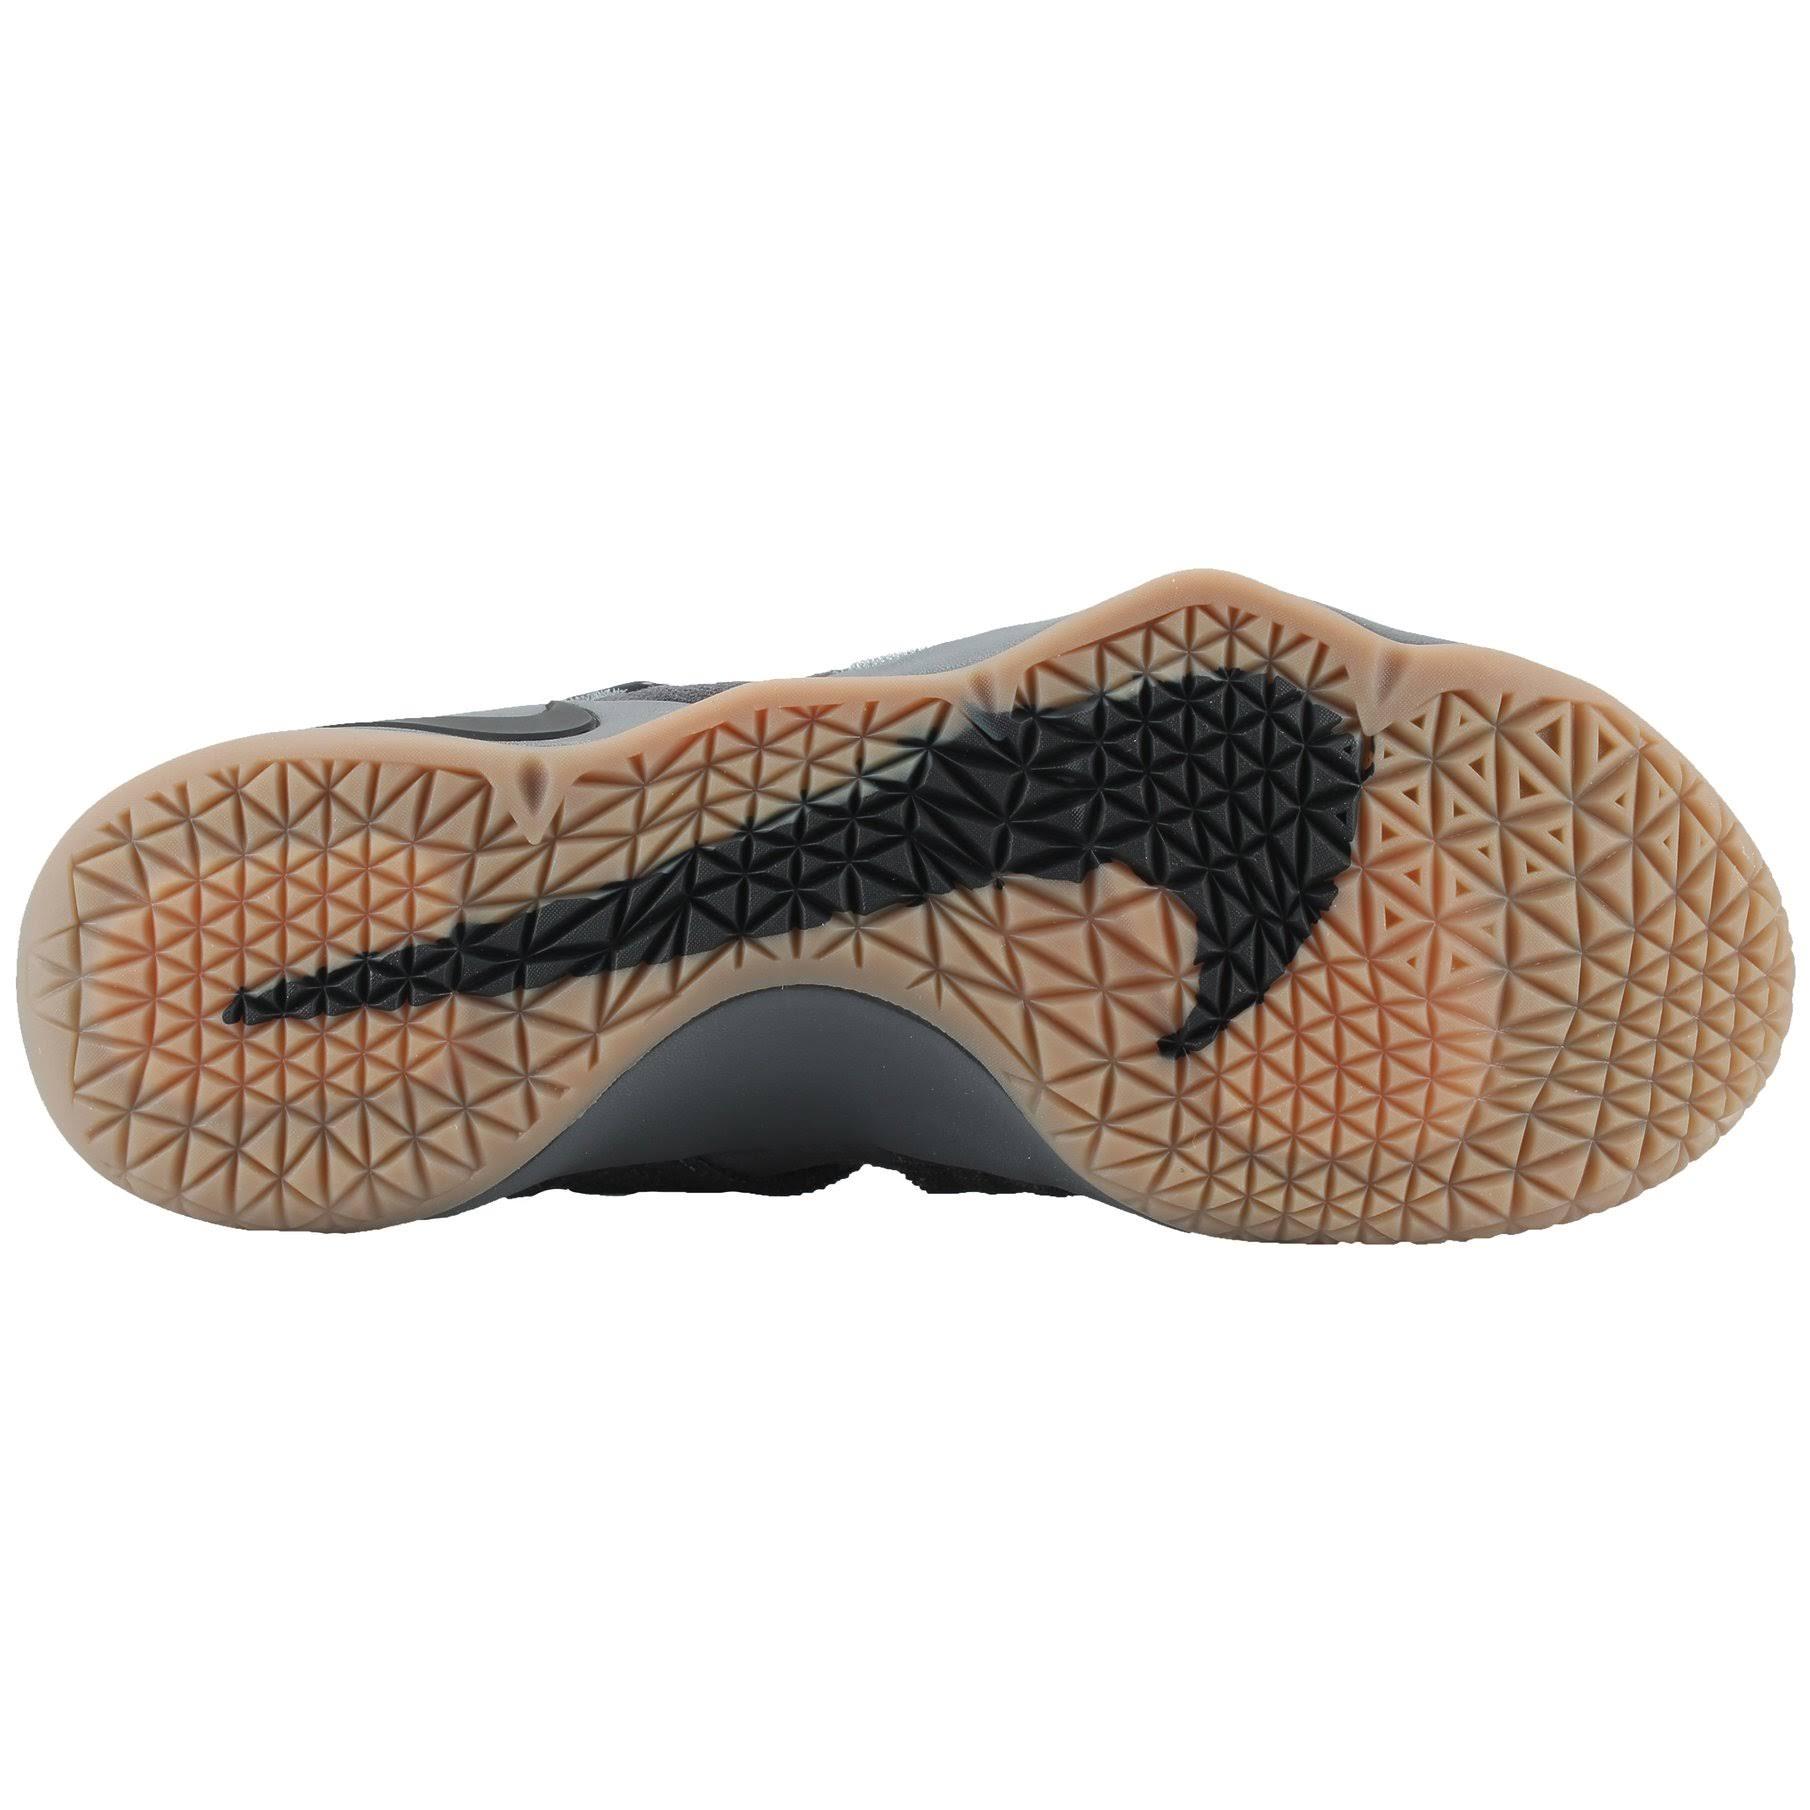 Größe 8 Basketballschuhe Soldier Dunkelgraue Nike Xi 897646 Lebron 5 003 Sfg 7AqwSaz8BS